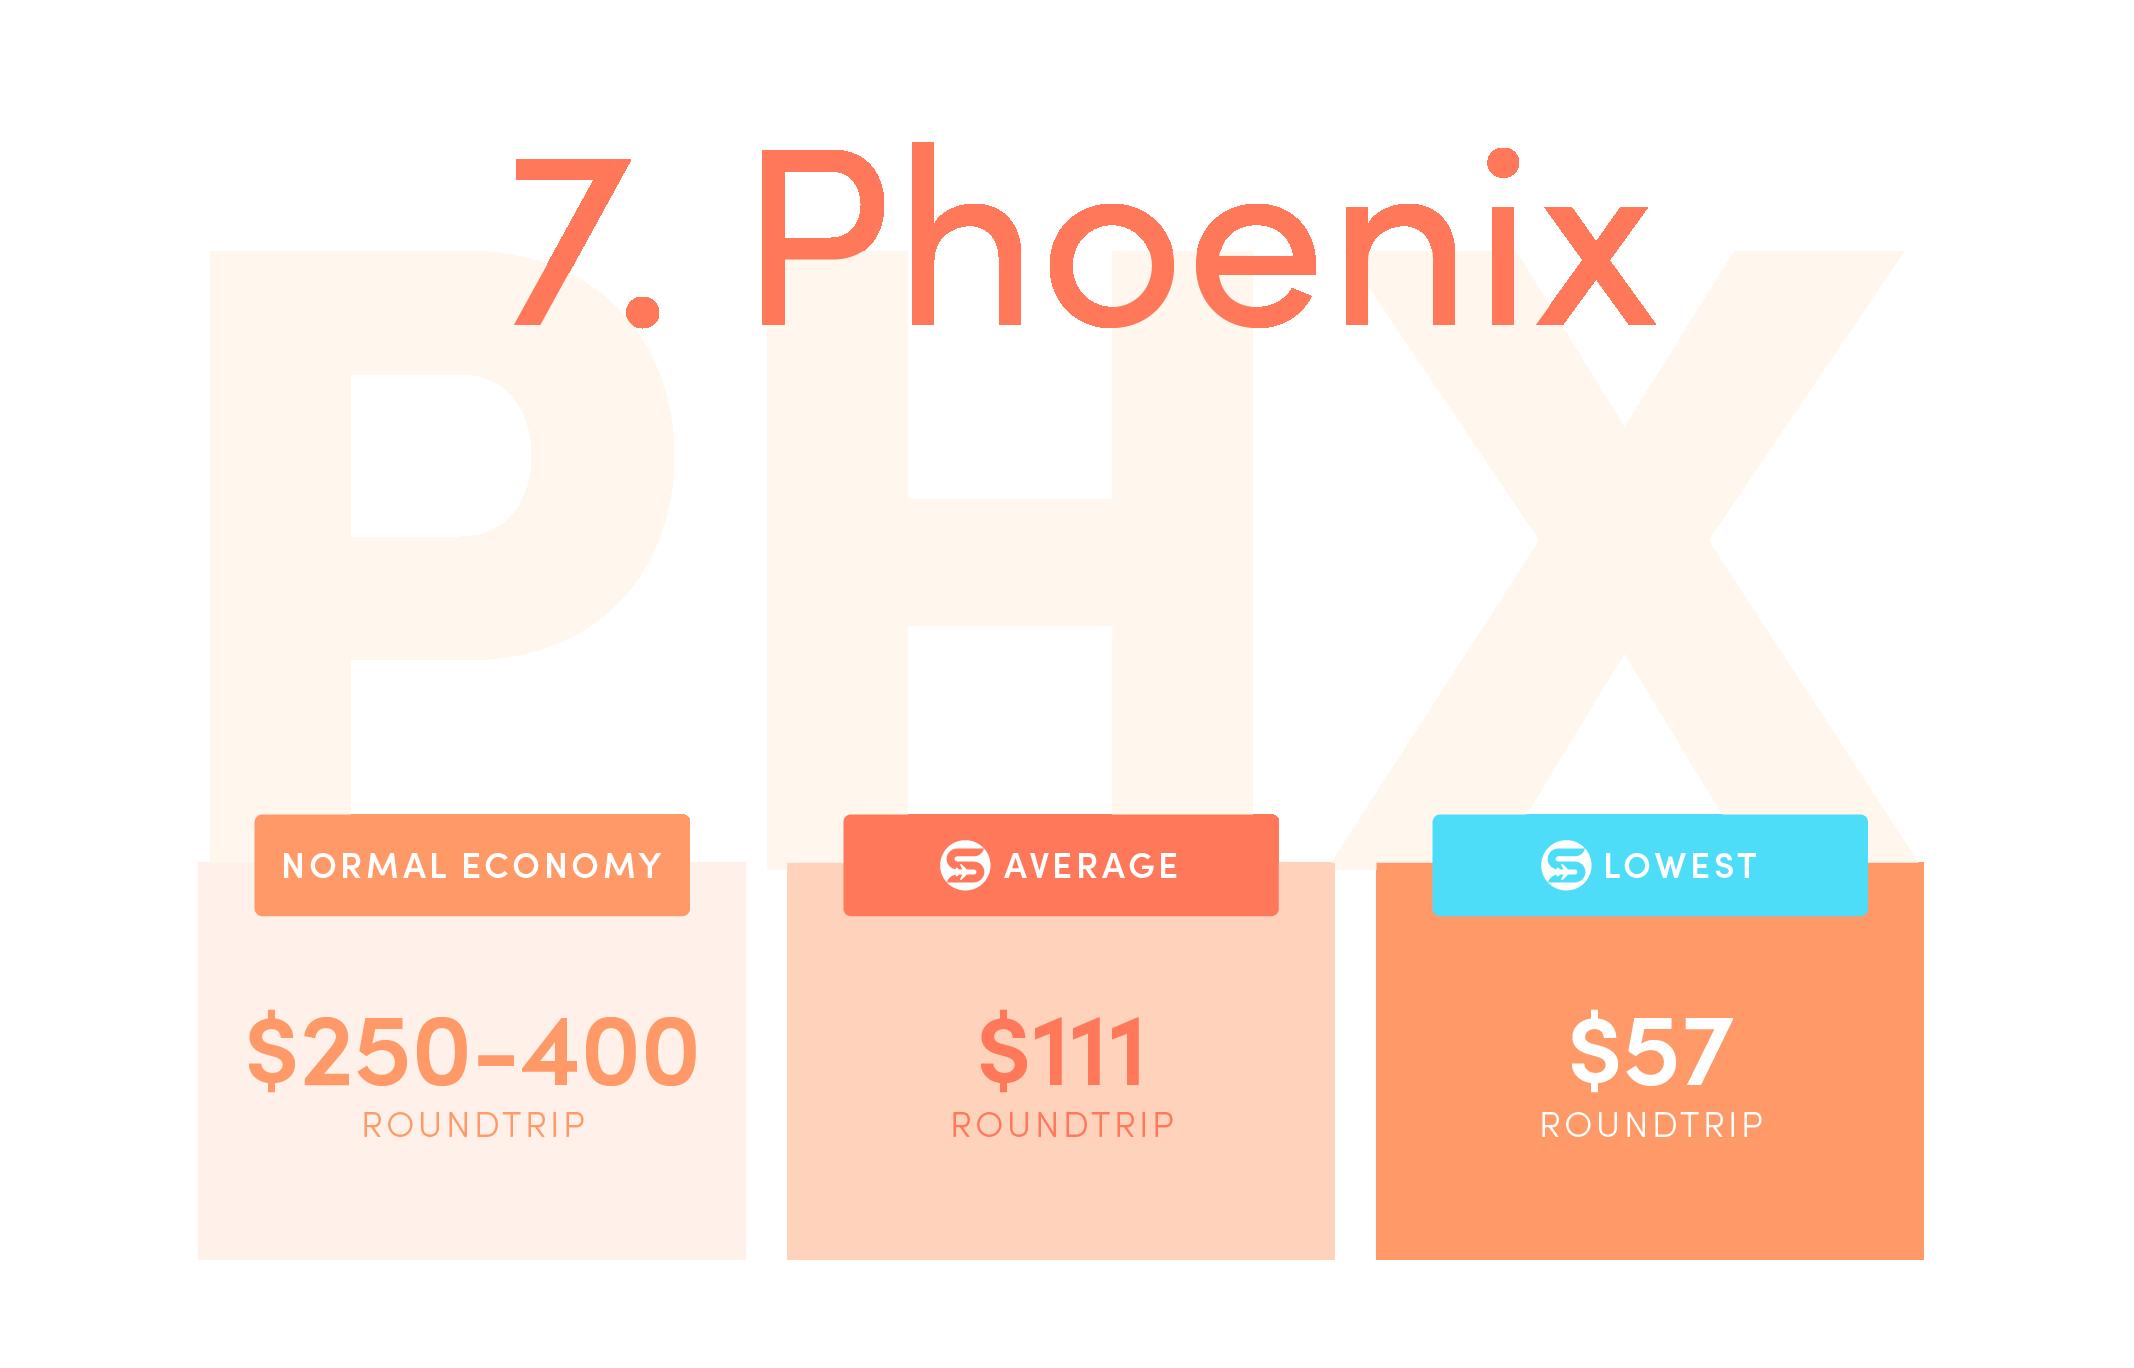 Phoenix (PHX).Normal economy price from the US: $250-$400 roundtrip.Average Scott's Cheap Flights economy price: $111 roundtrip.Lowest Scott's Cheap Flights price in 2021: $57 roundtrip.